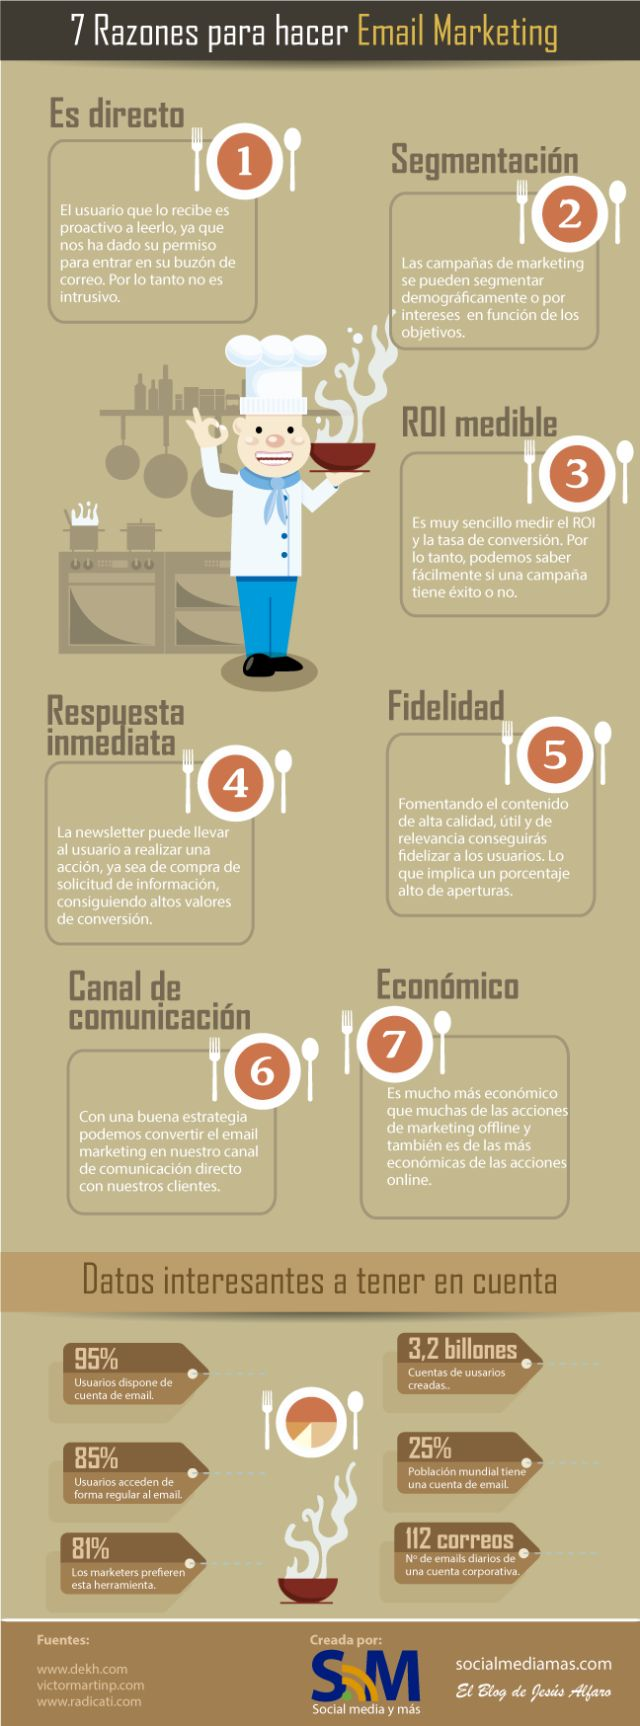 7 razones para hacer #email #marketing